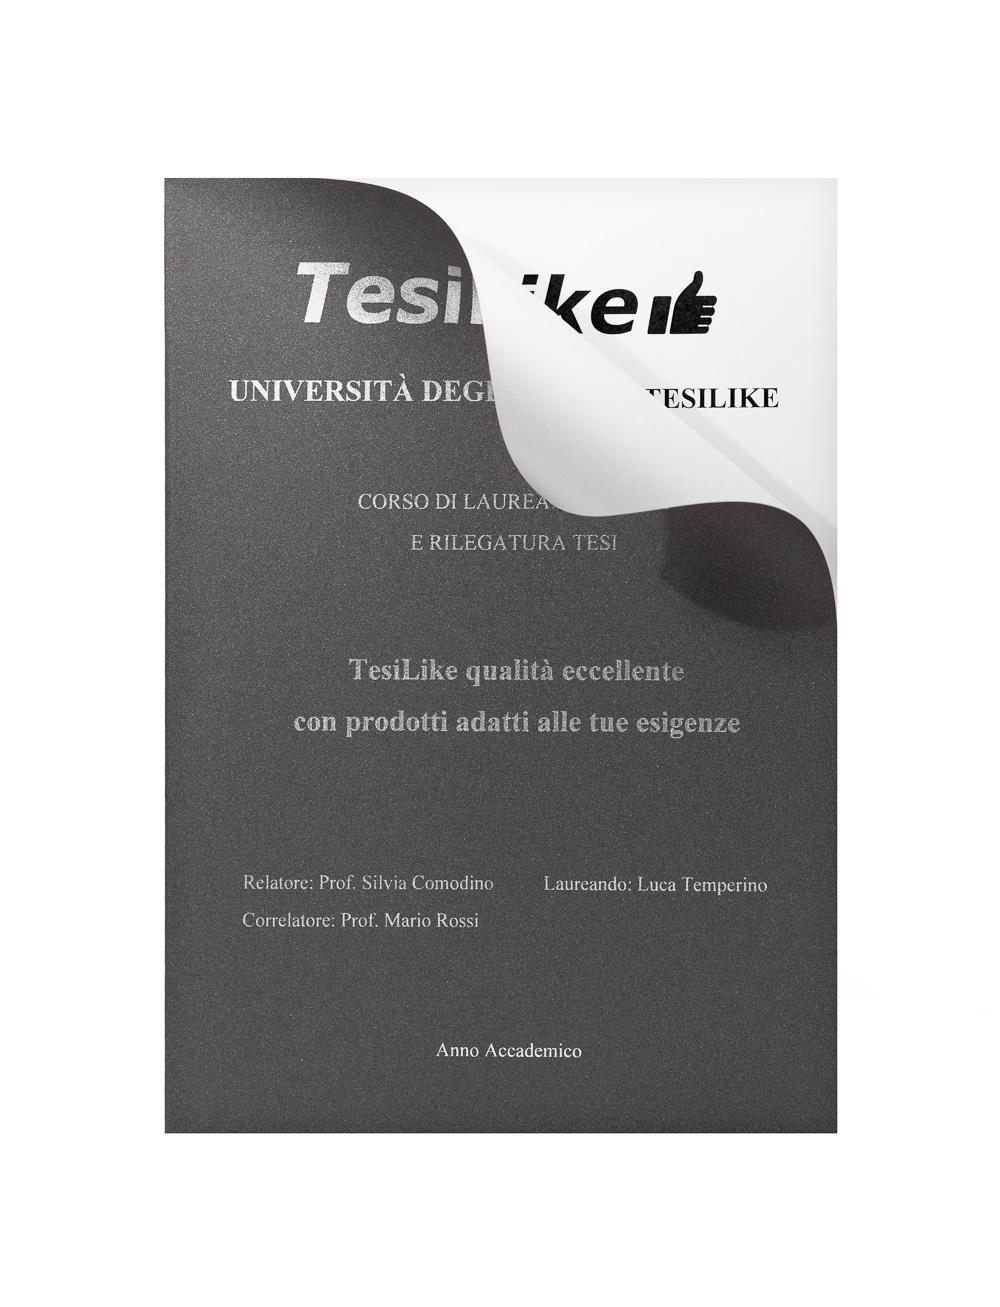 copertina-tesi-flessibile-grigia-frontespizio-argento-dettaglio-tesilike